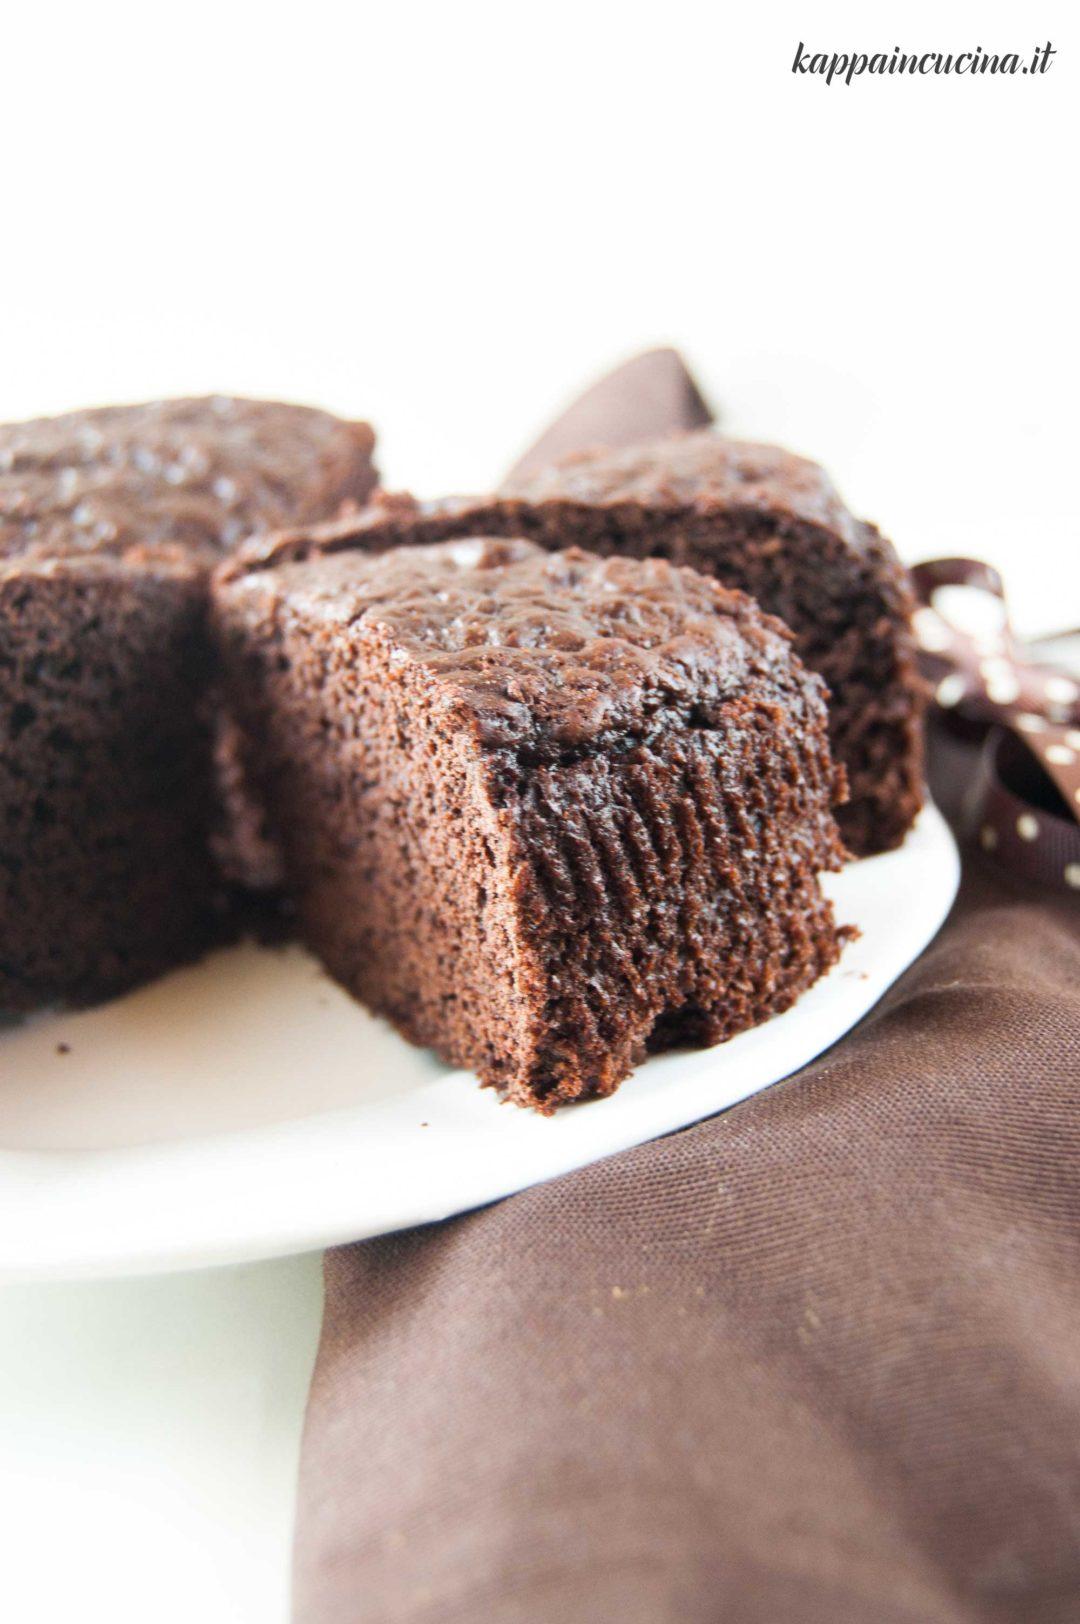 Torta Senza Uova Al Cioccolato.Torta Al Cioccolato